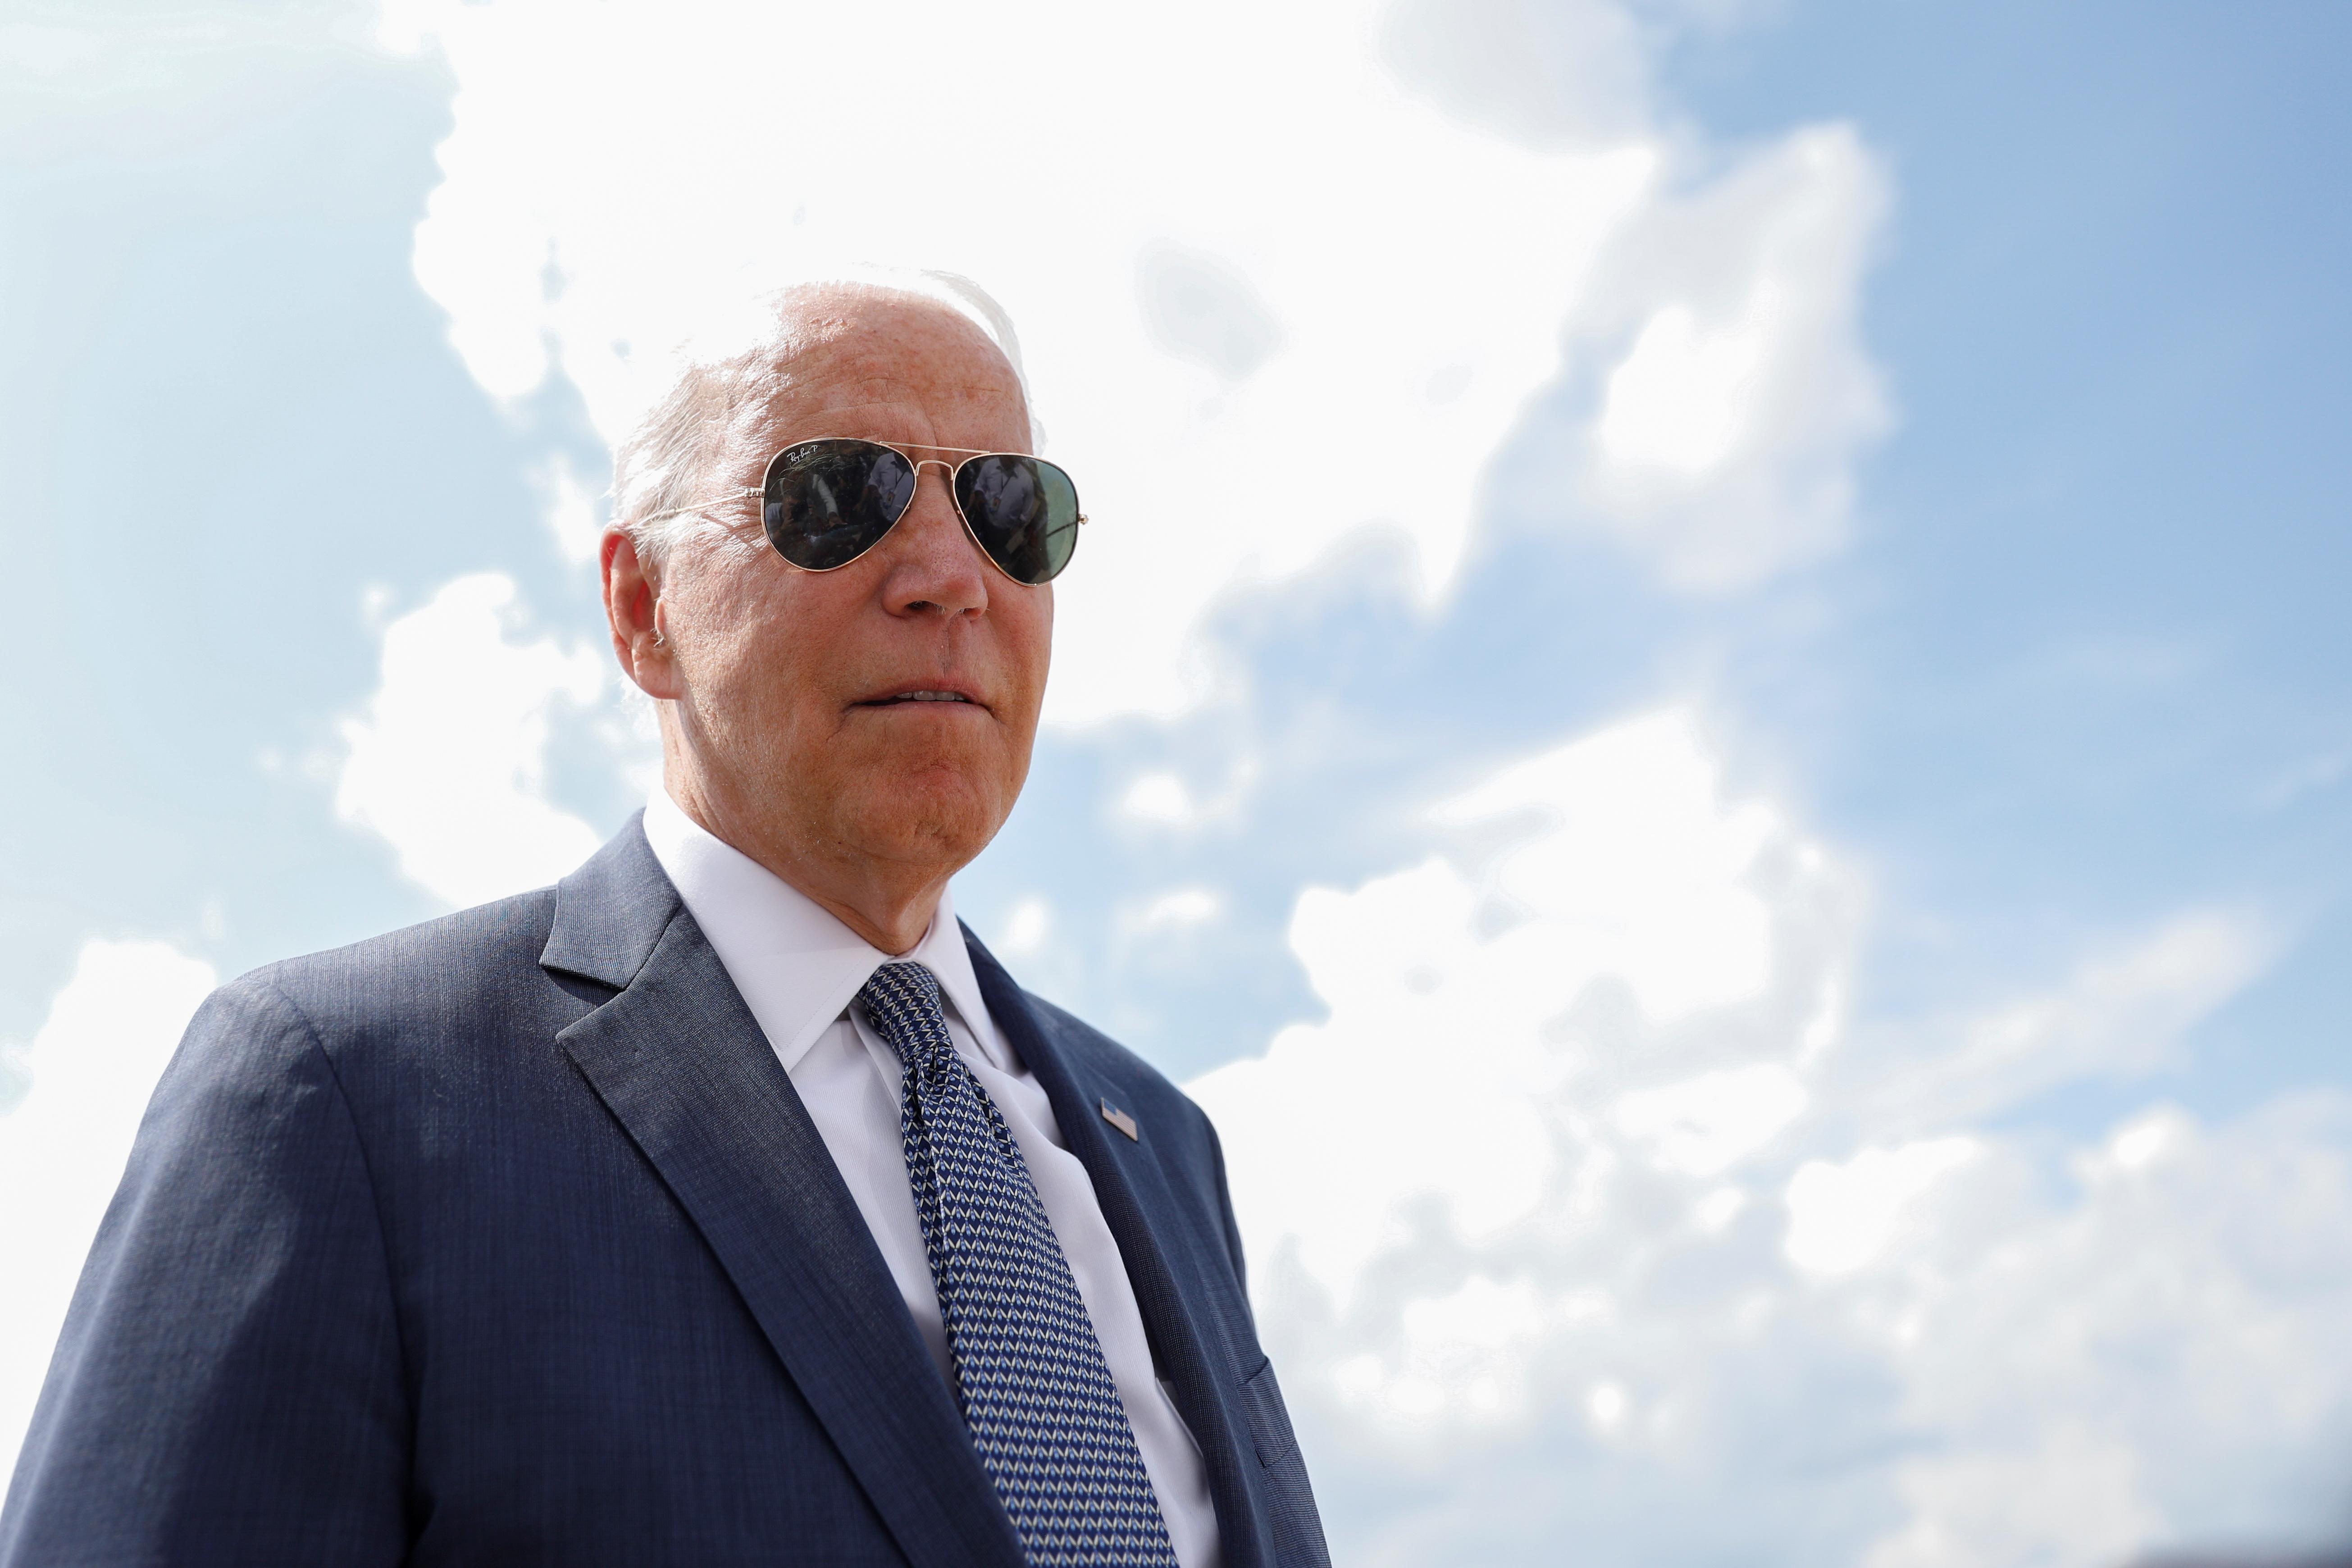 U.S. President Joe Biden walks to board Air Force One at Joint Base Andrews in Maryland, U.S., July 9, 2021. REUTERS/Tom Brenner